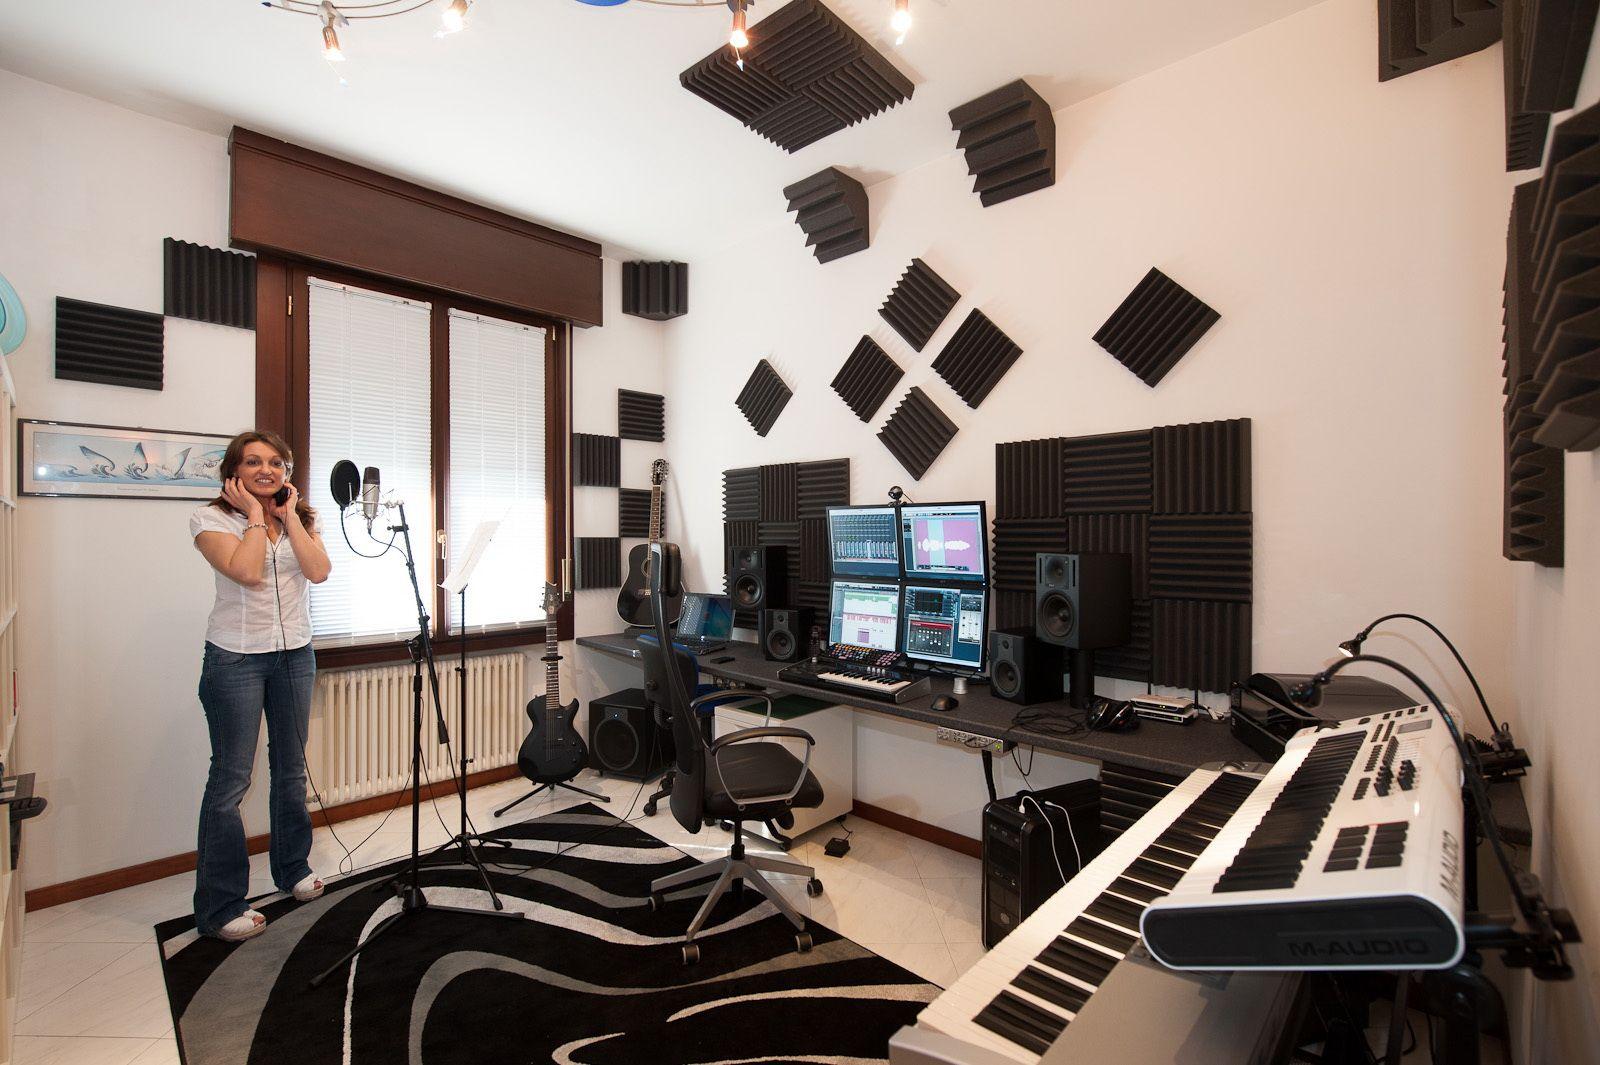 20 home studio recording setup ideas to inspire you http://www